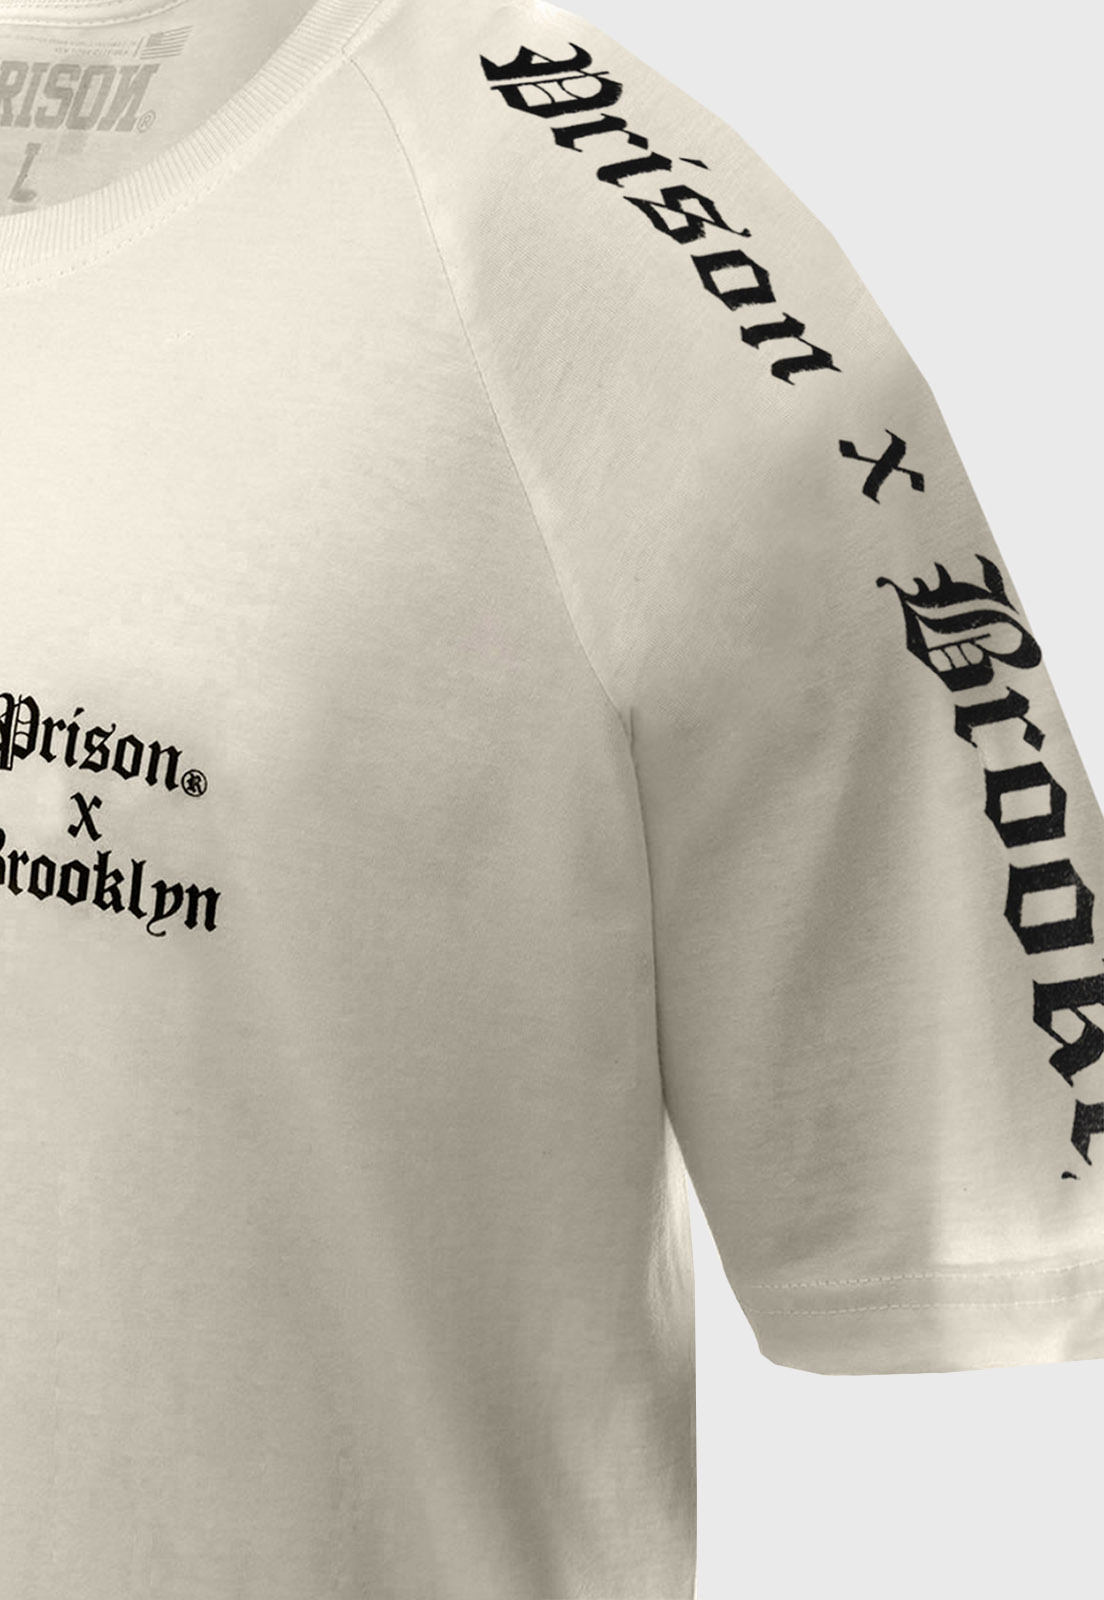 Camiseta Prison Raglan Brooklyn Off white